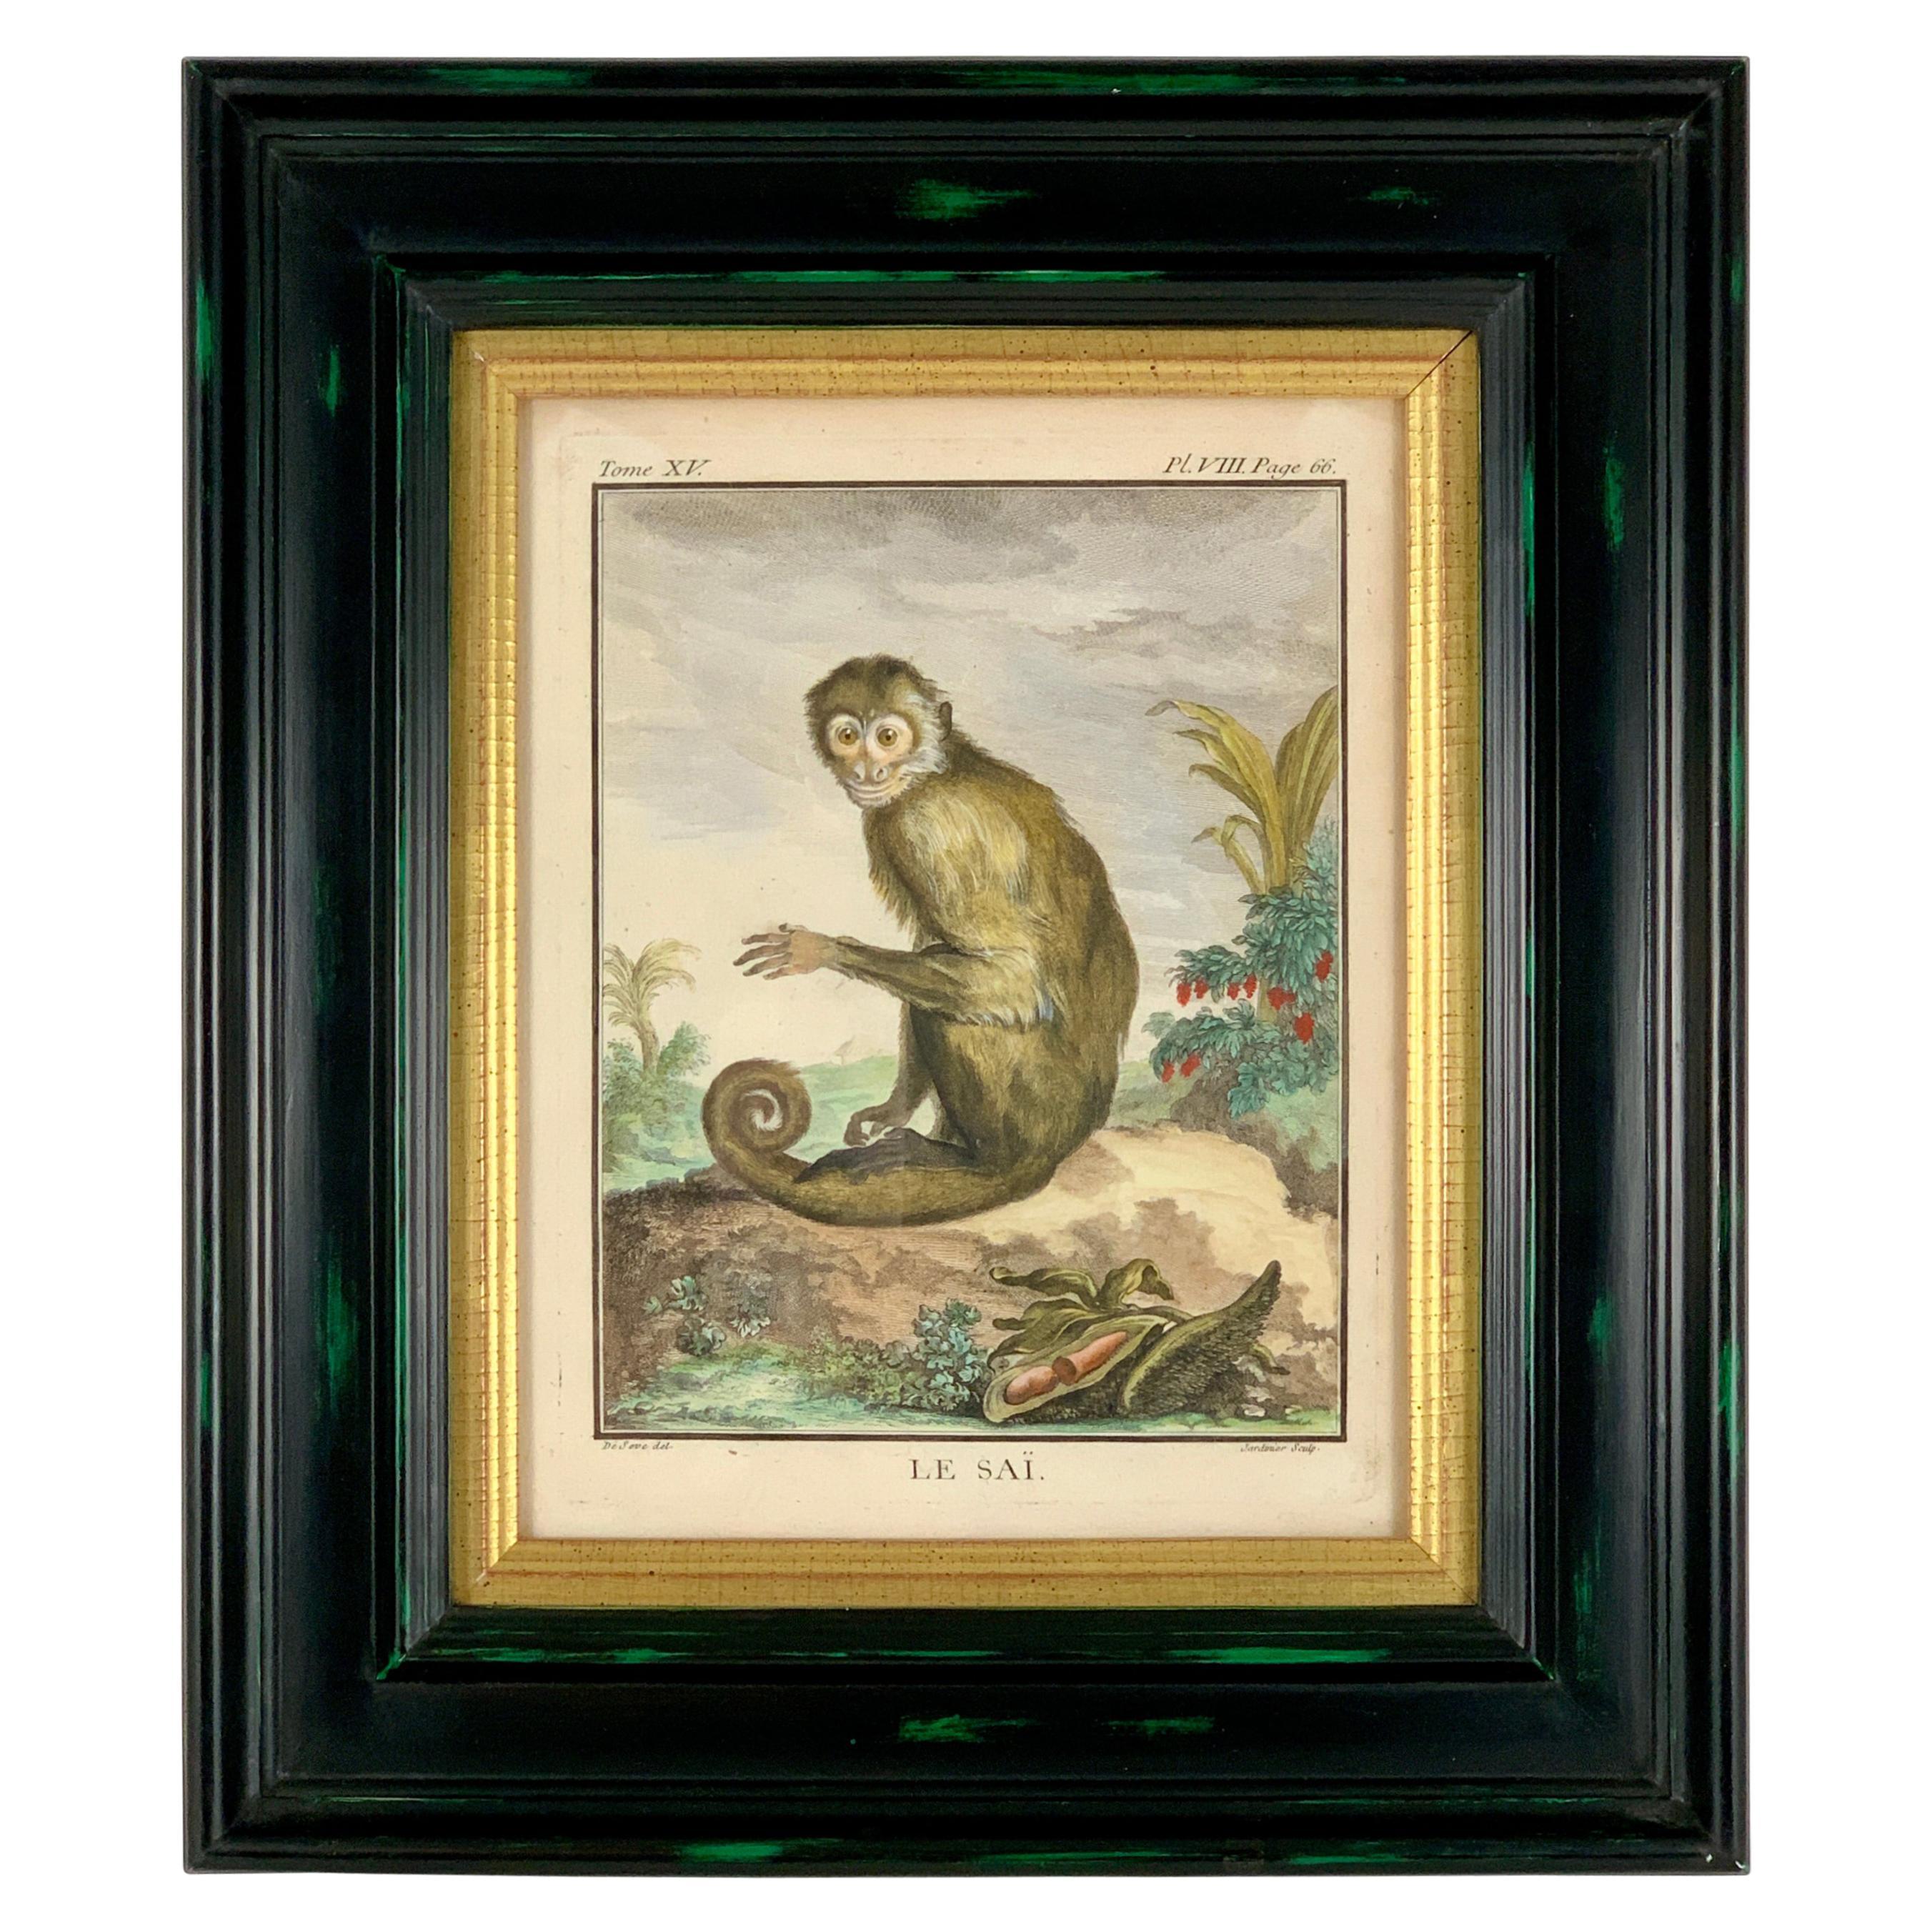 Framed 18th Century Comte de Buffon Squirrel Monkey French Engraving, Le Saï